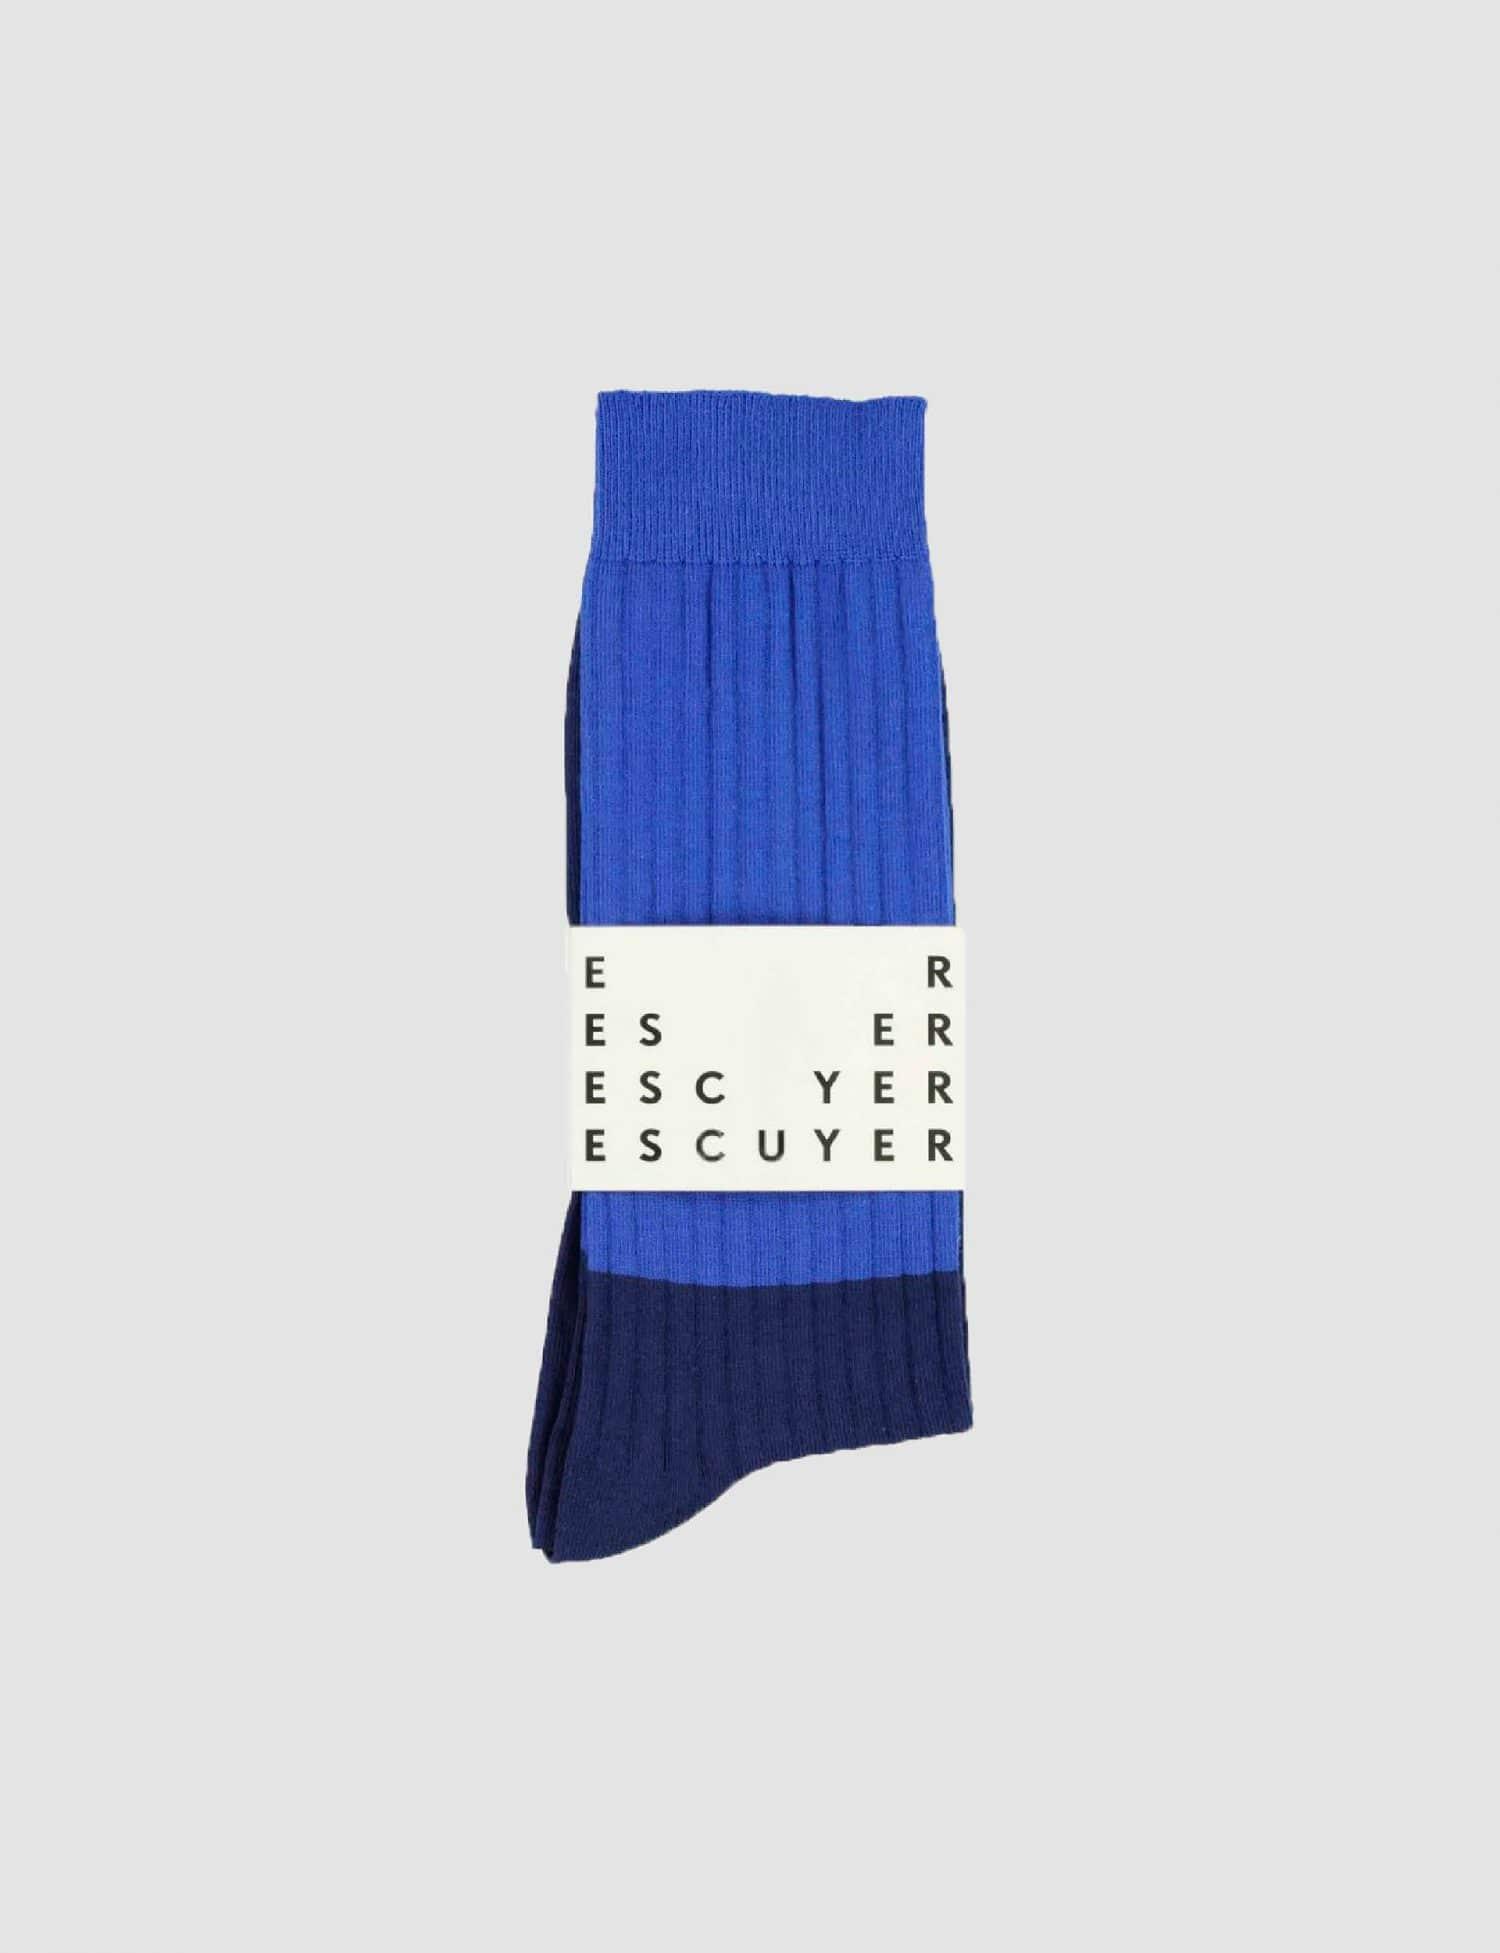 Escuyer - Color block - Blue